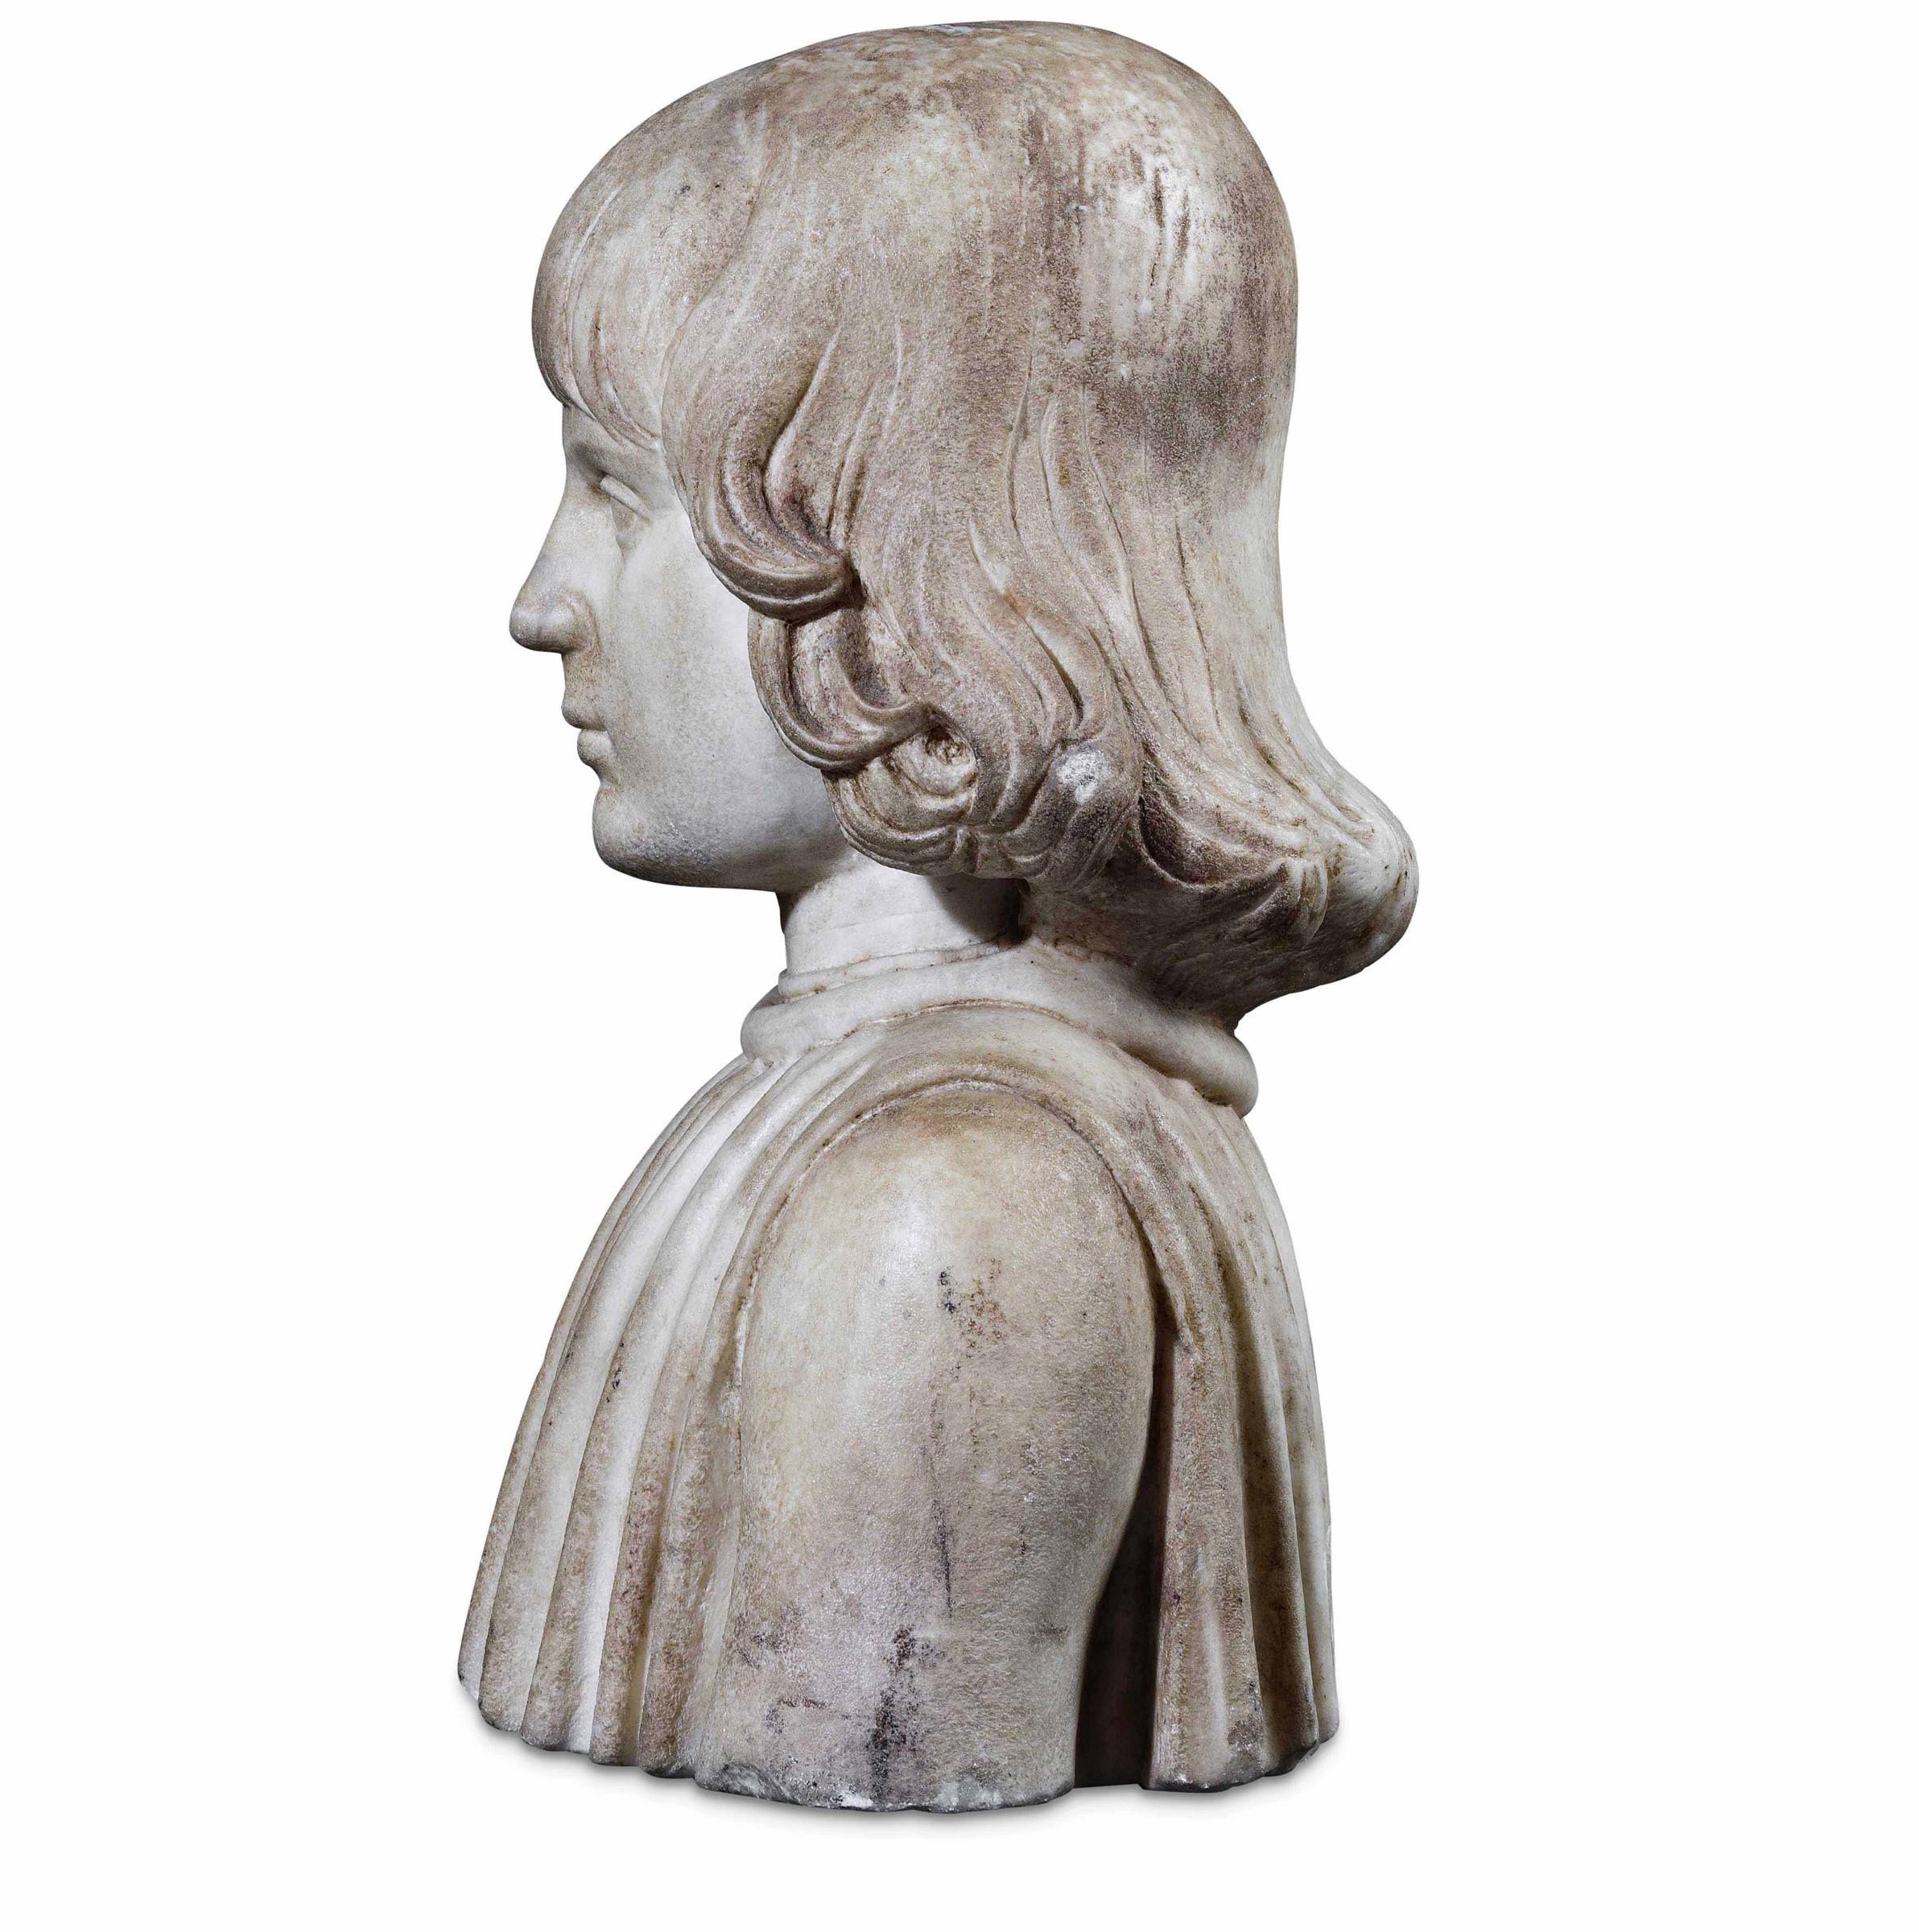 A marble bust, attr. F. Laurana, 1400s - cm 41x32x22. L'opera è accompagnata da una [...] - Image 3 of 4